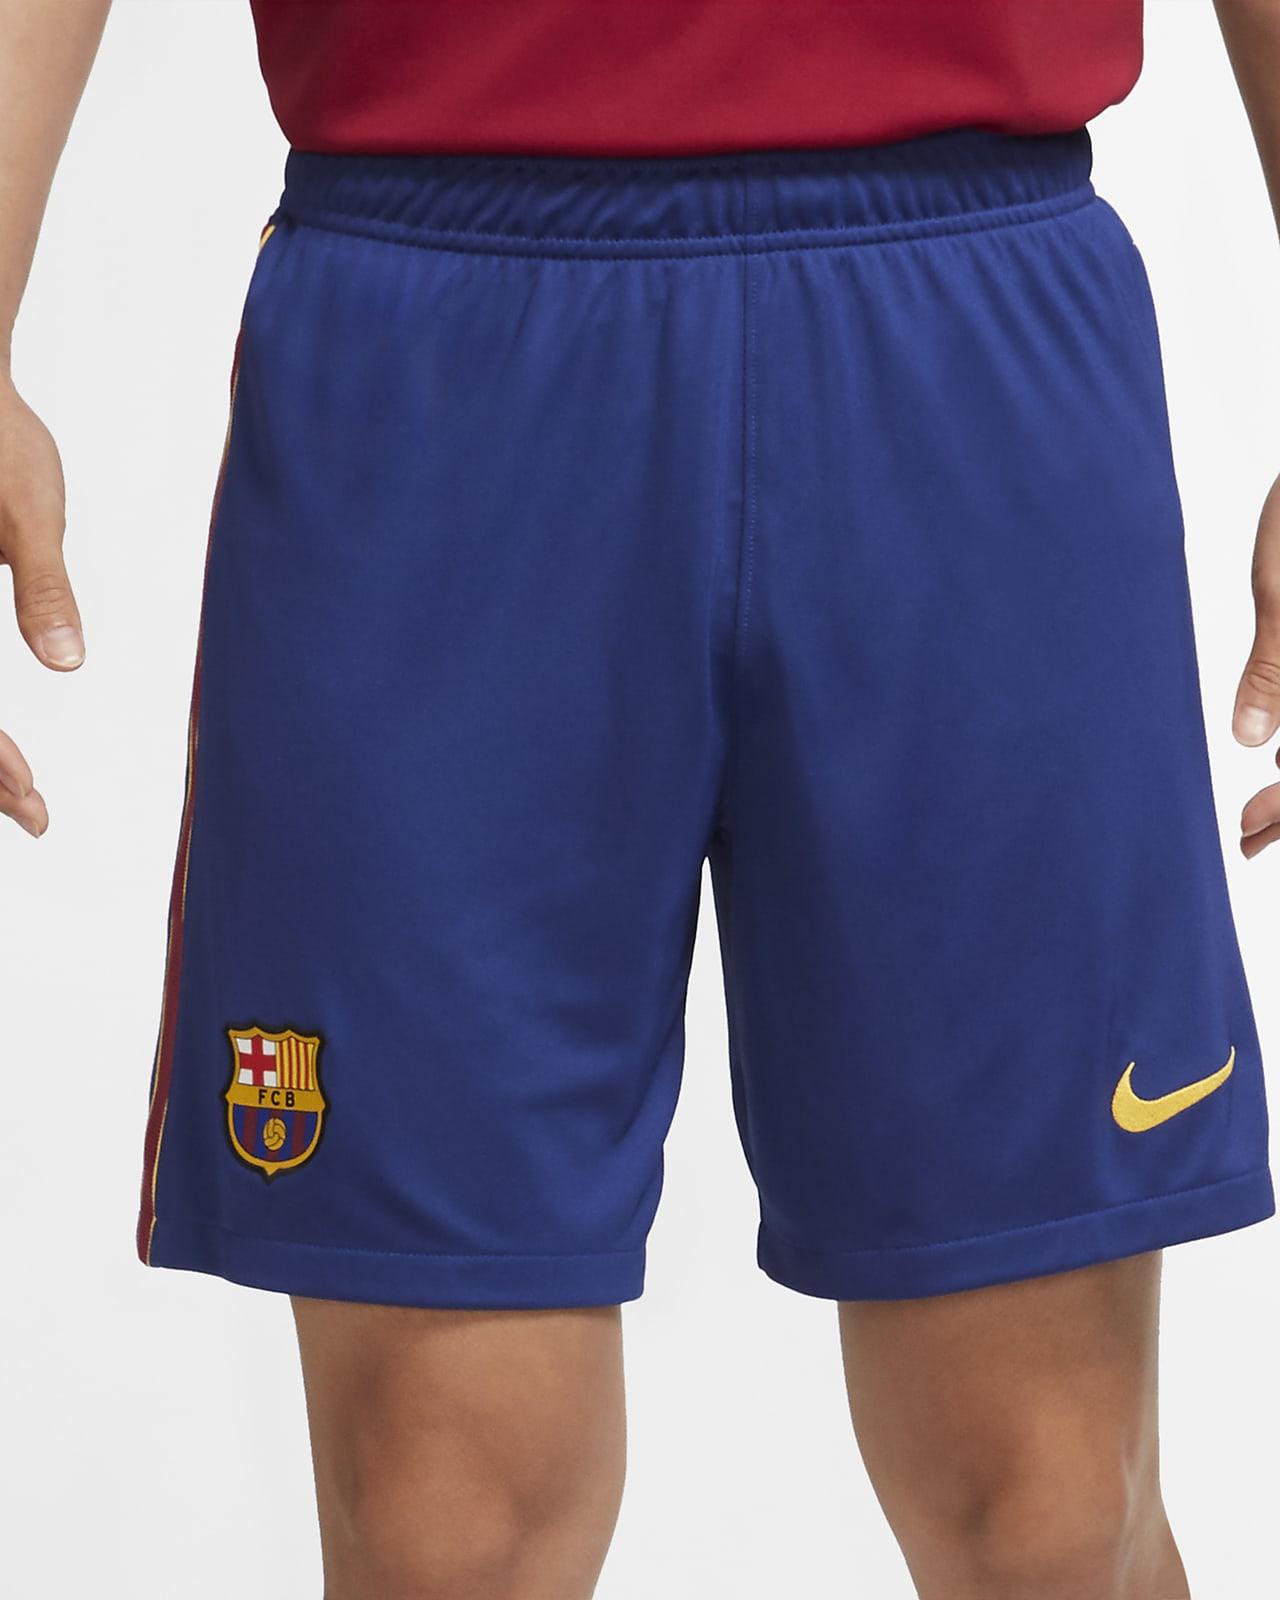 FC Barcelona 2020/21 Stadium hazai/Away férfi futballrövidnadrág